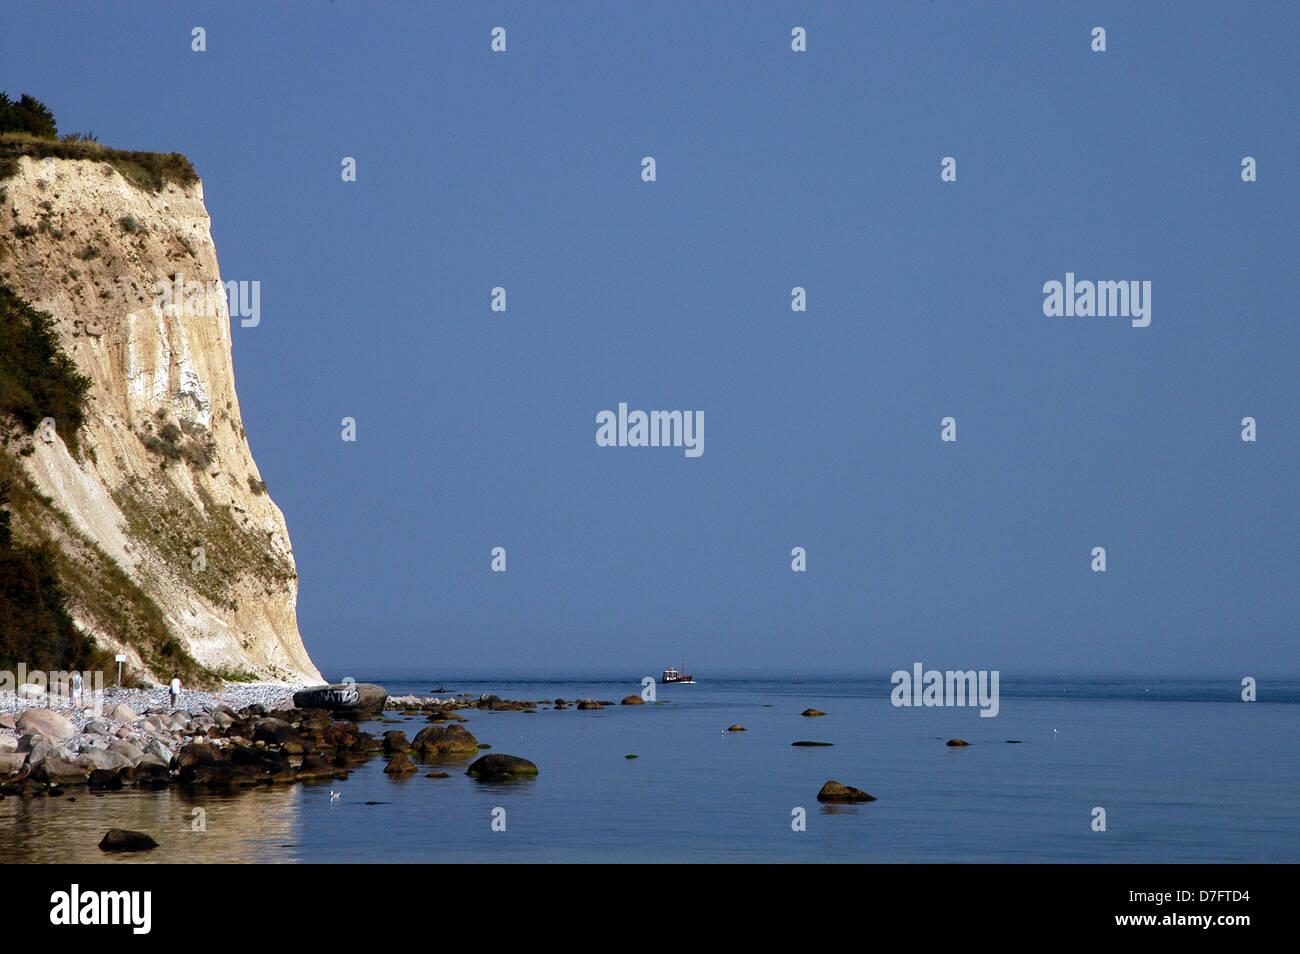 Germany, Baltic Sea, Rügen, Ruegen, cape Arkona, chalk rock, Kap Arkona, Kreidefelsen - Stock Image